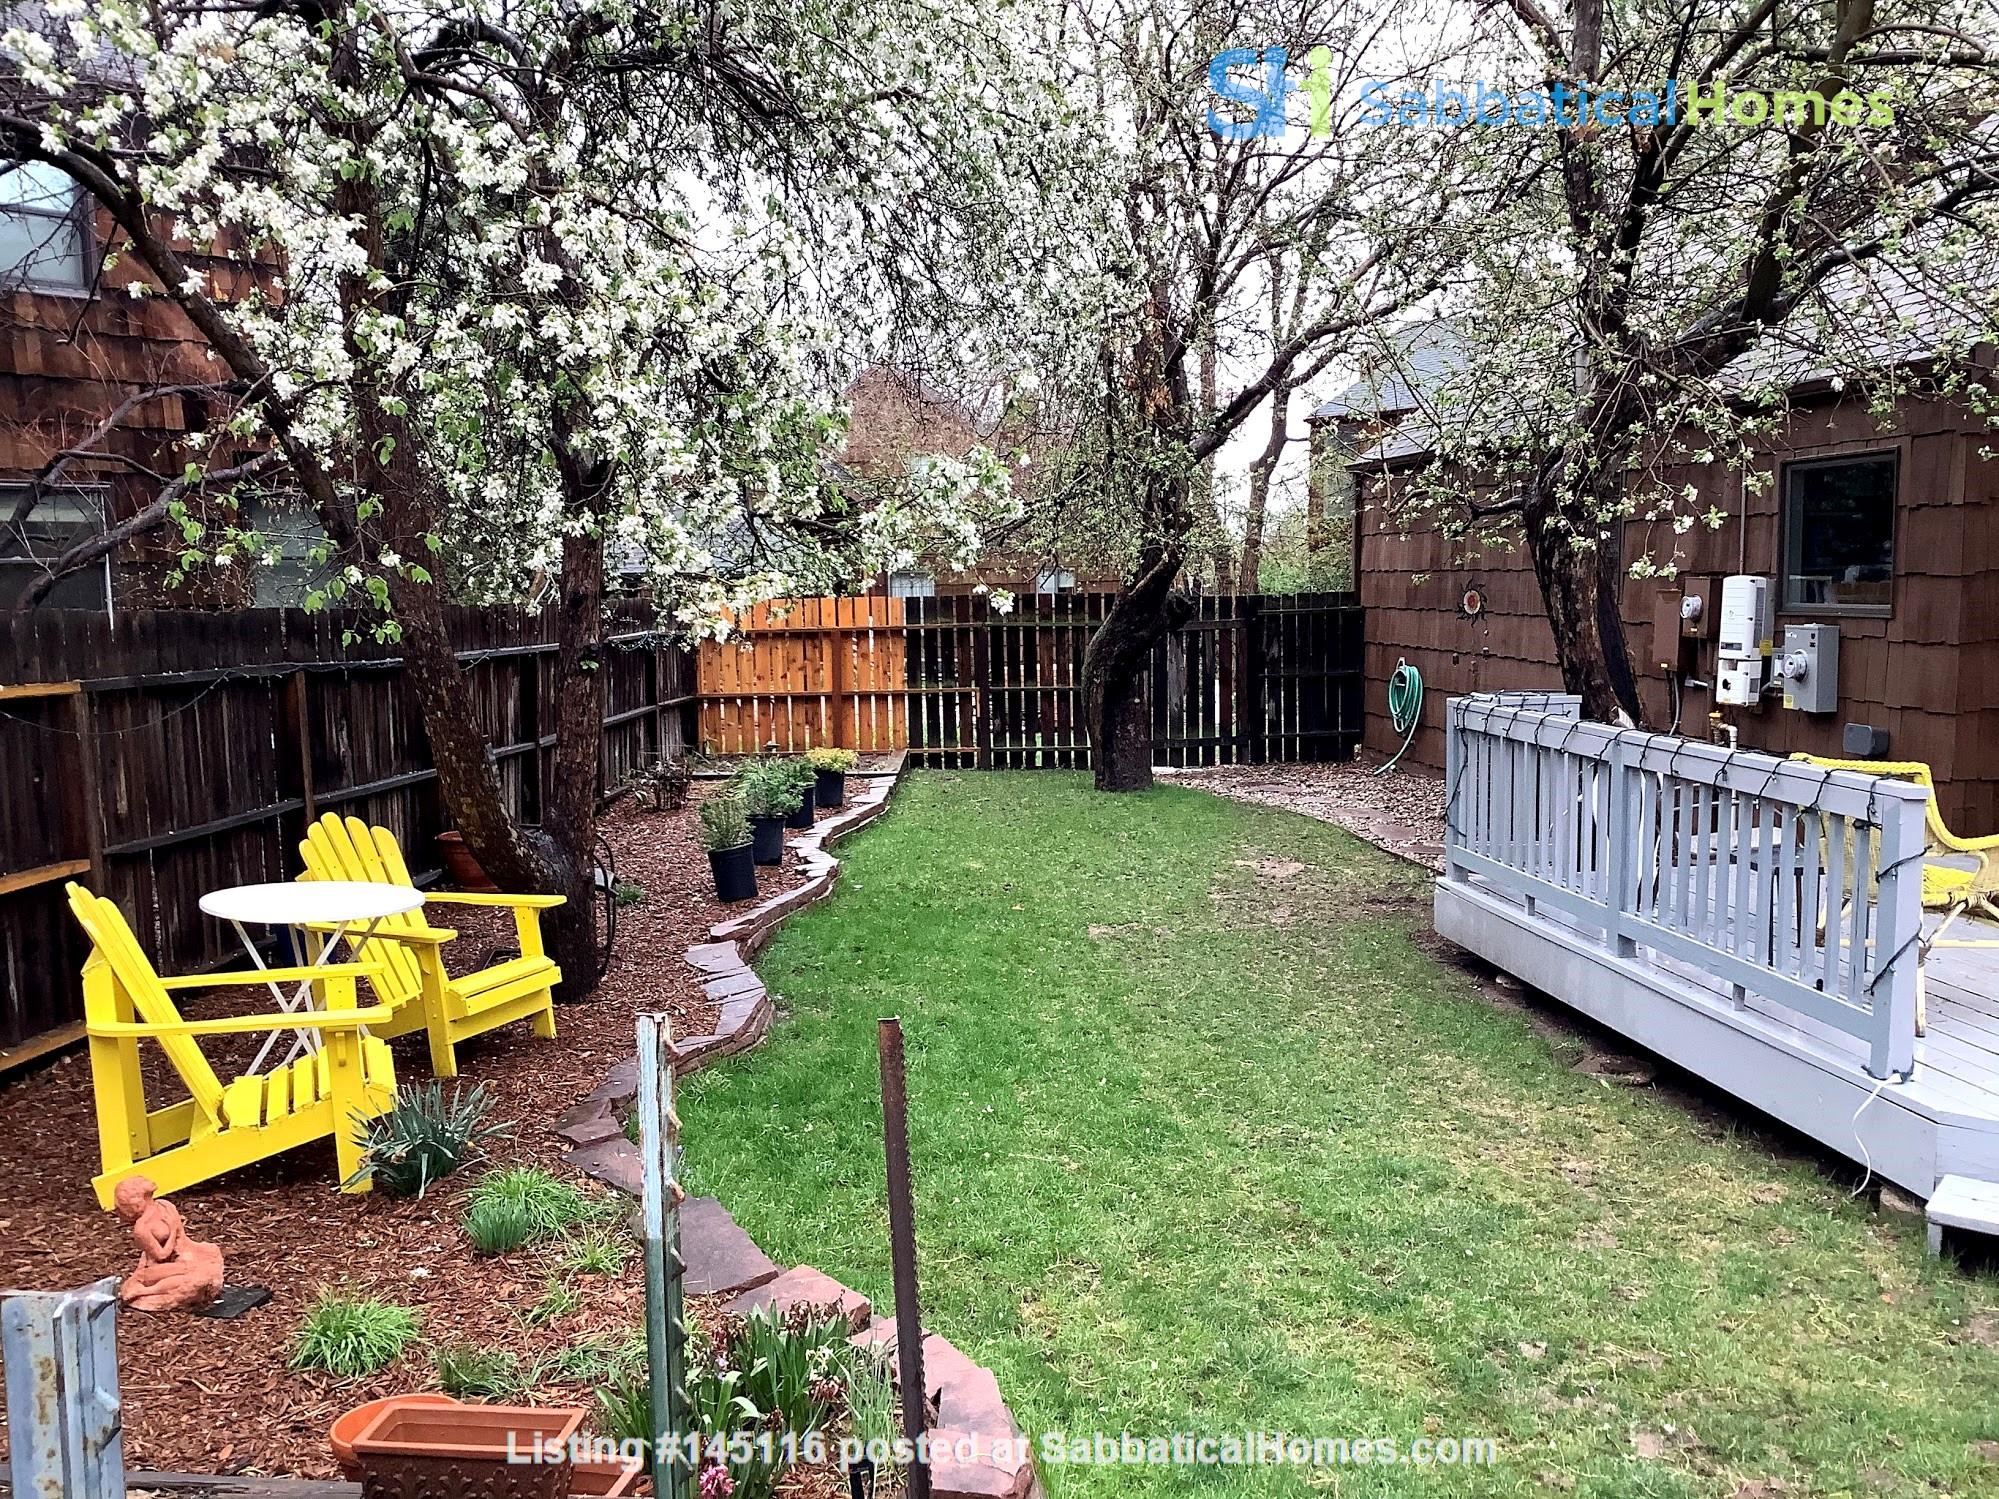 Fully Furnished Boulder Home Near Community Gardens Home Rental in Boulder, Colorado, United States 8